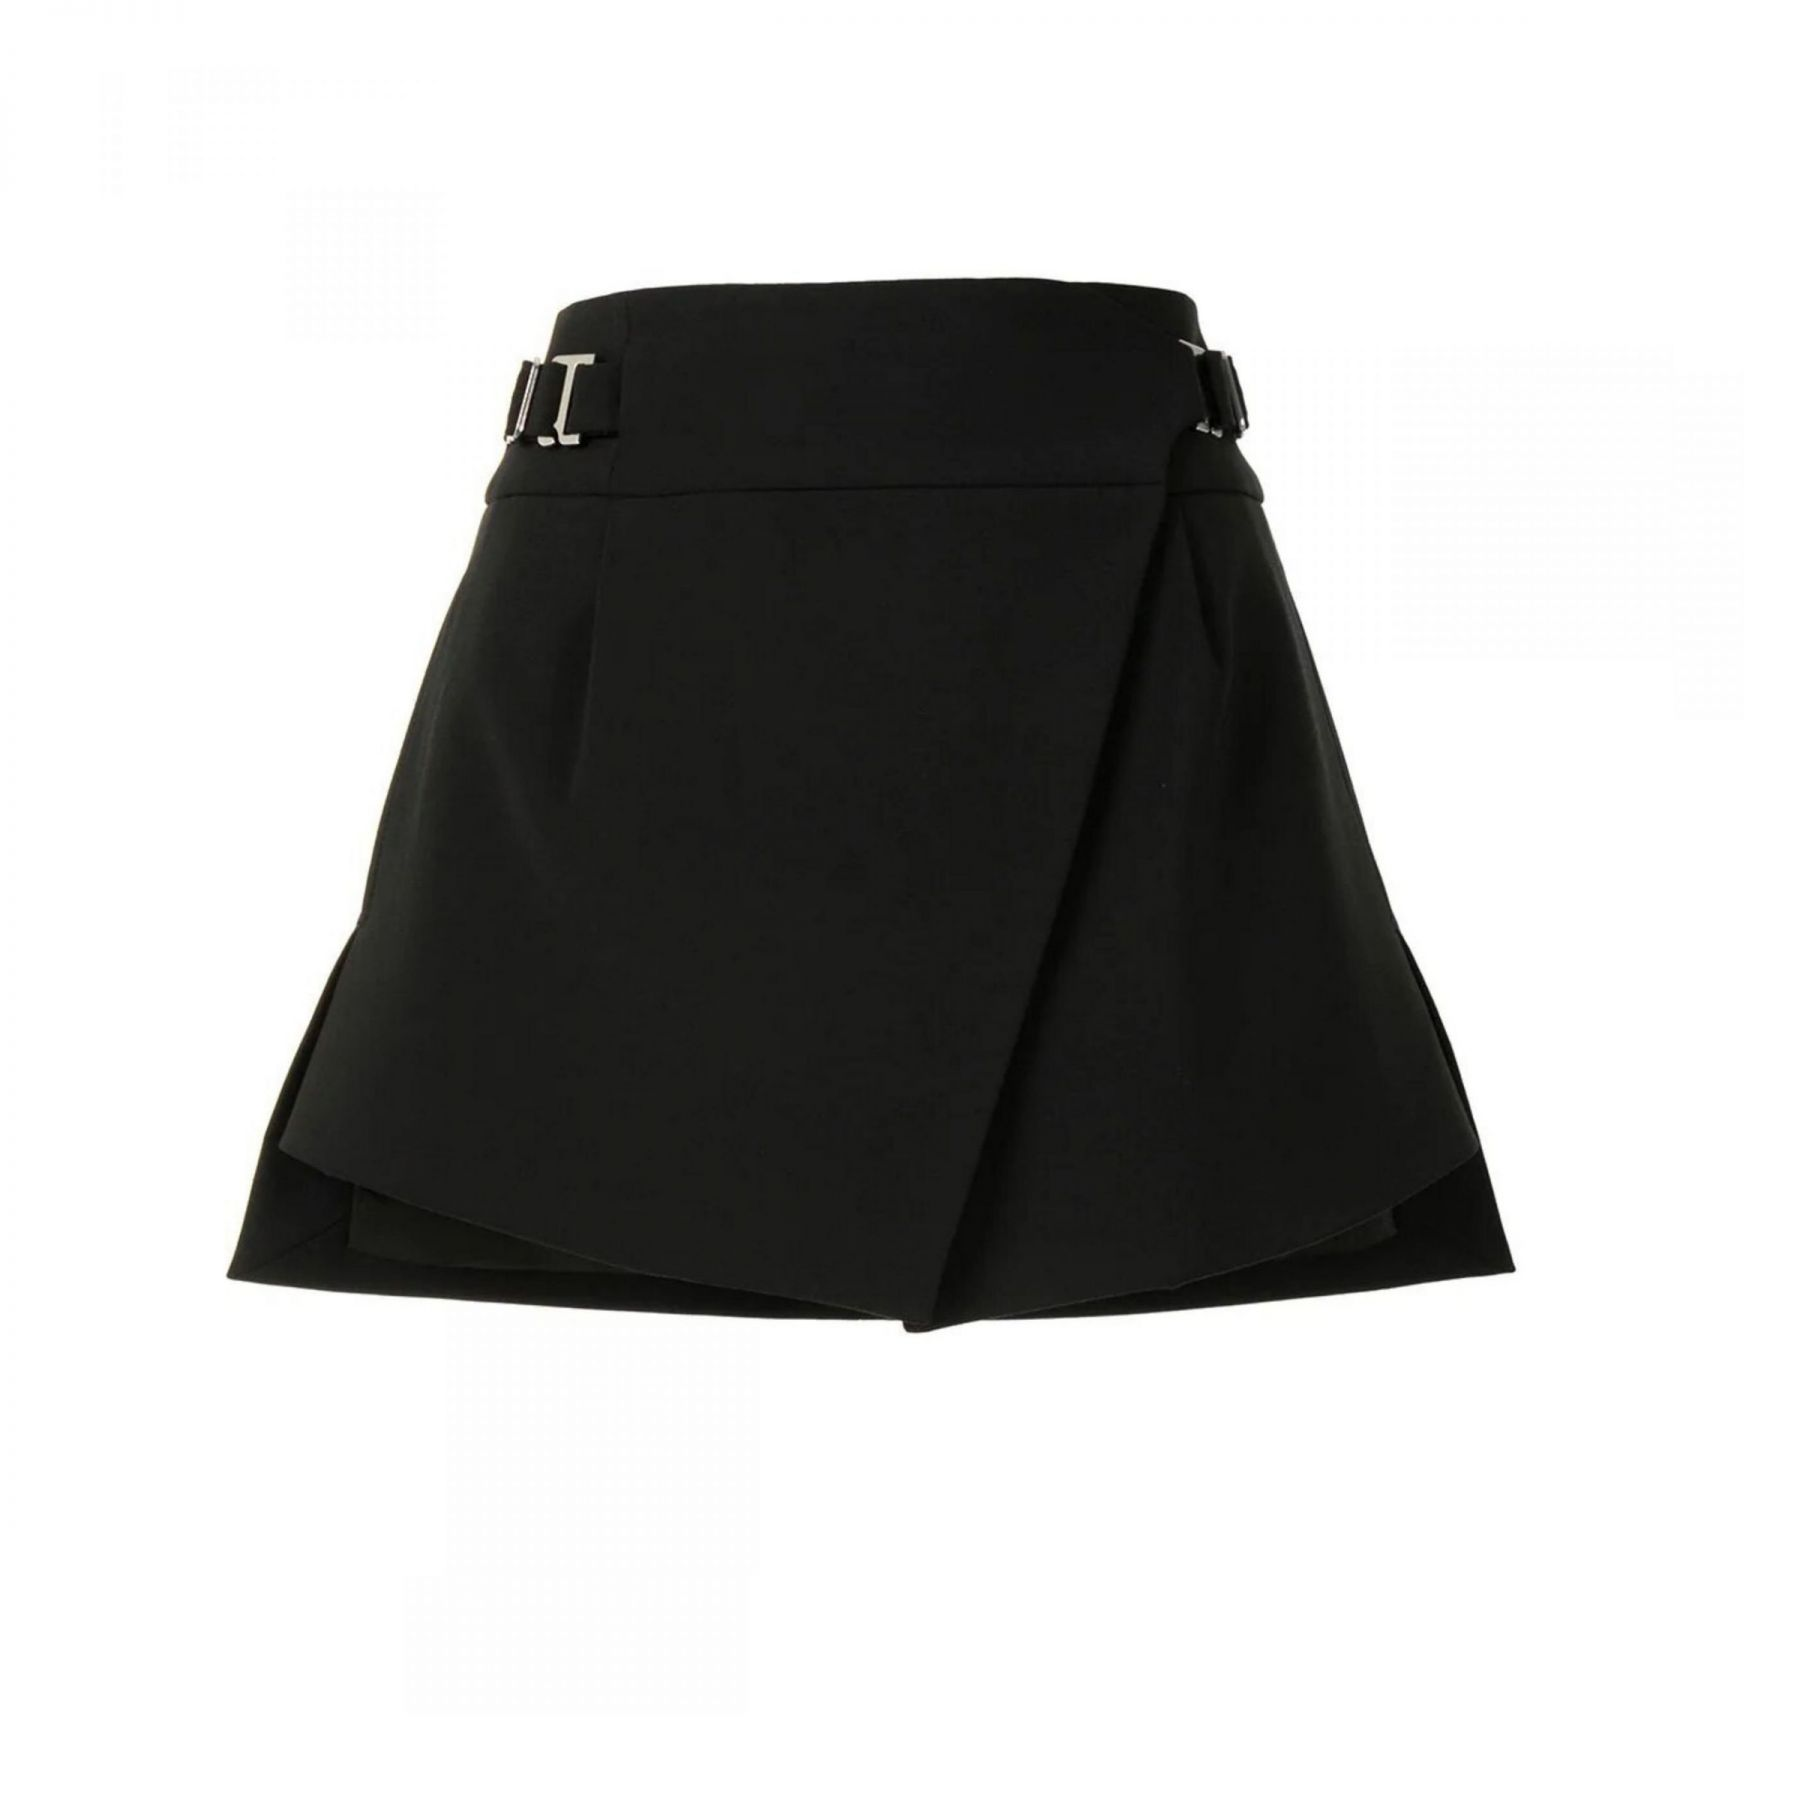 Юбка-мини Dion Lee Interlock Tailored черная